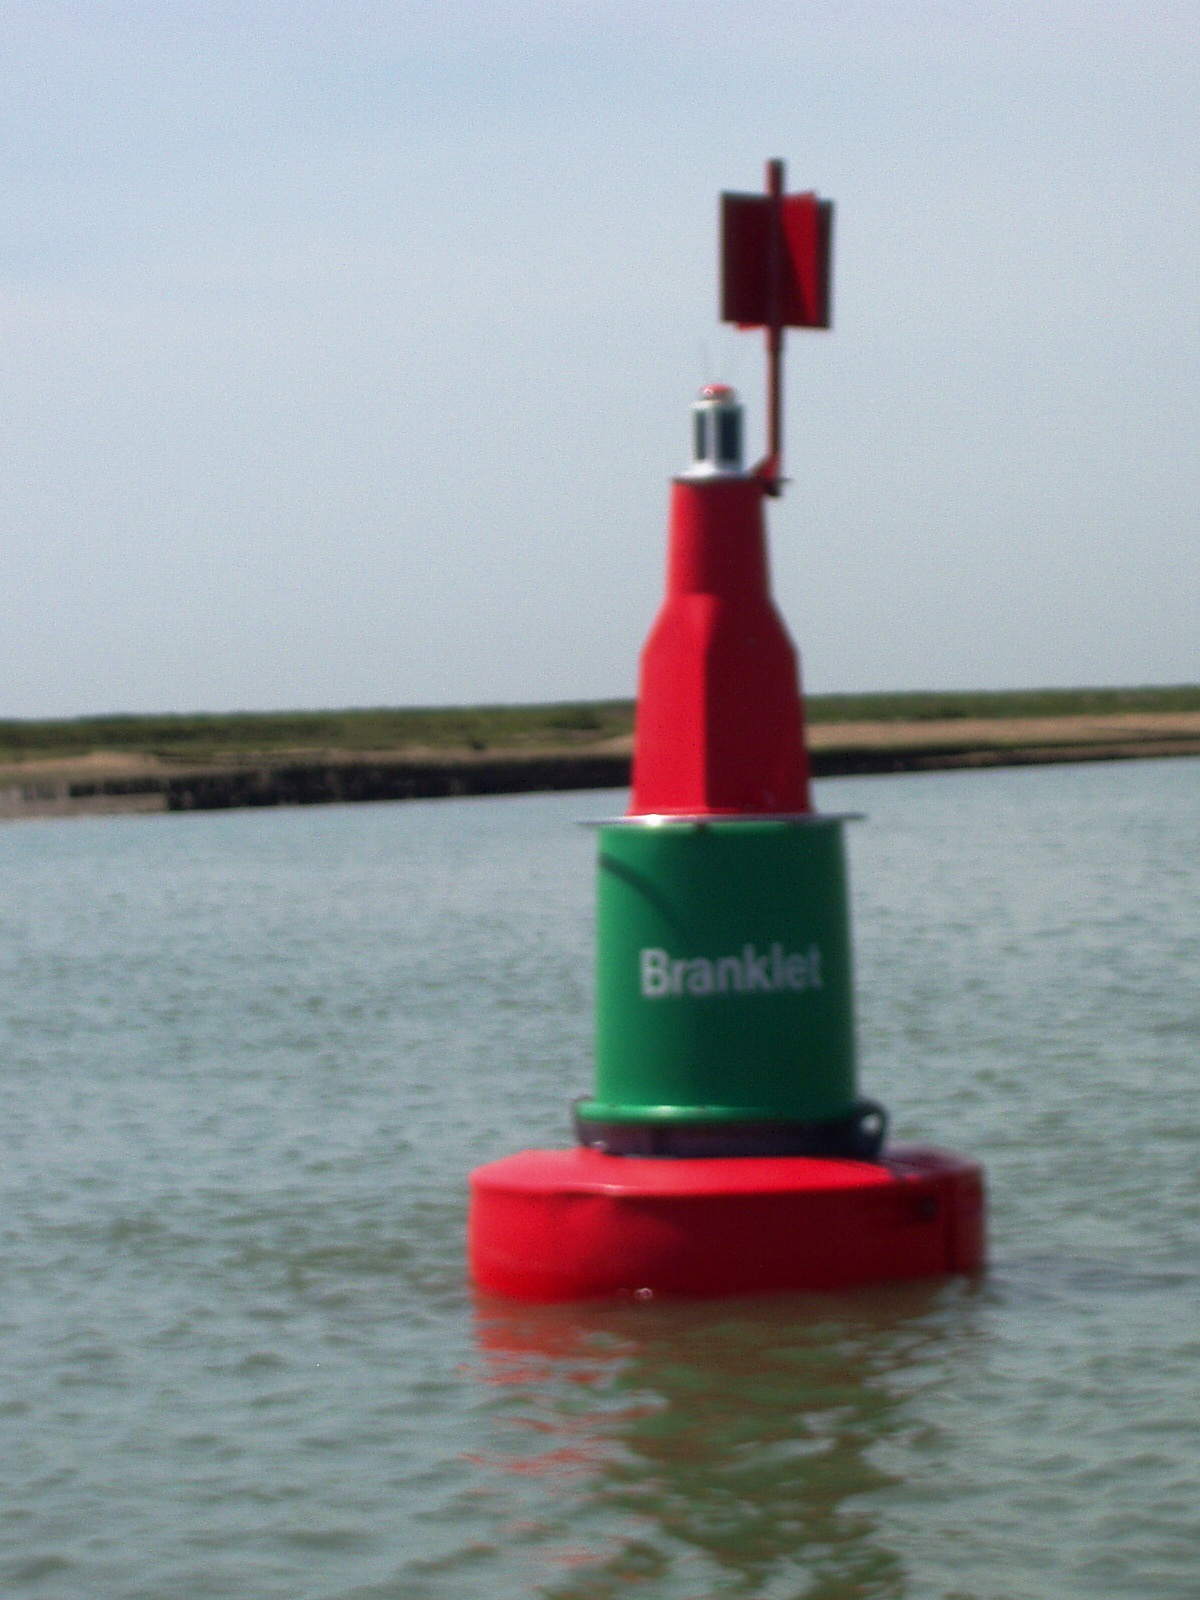 navigation how to take bering on chnanel marker